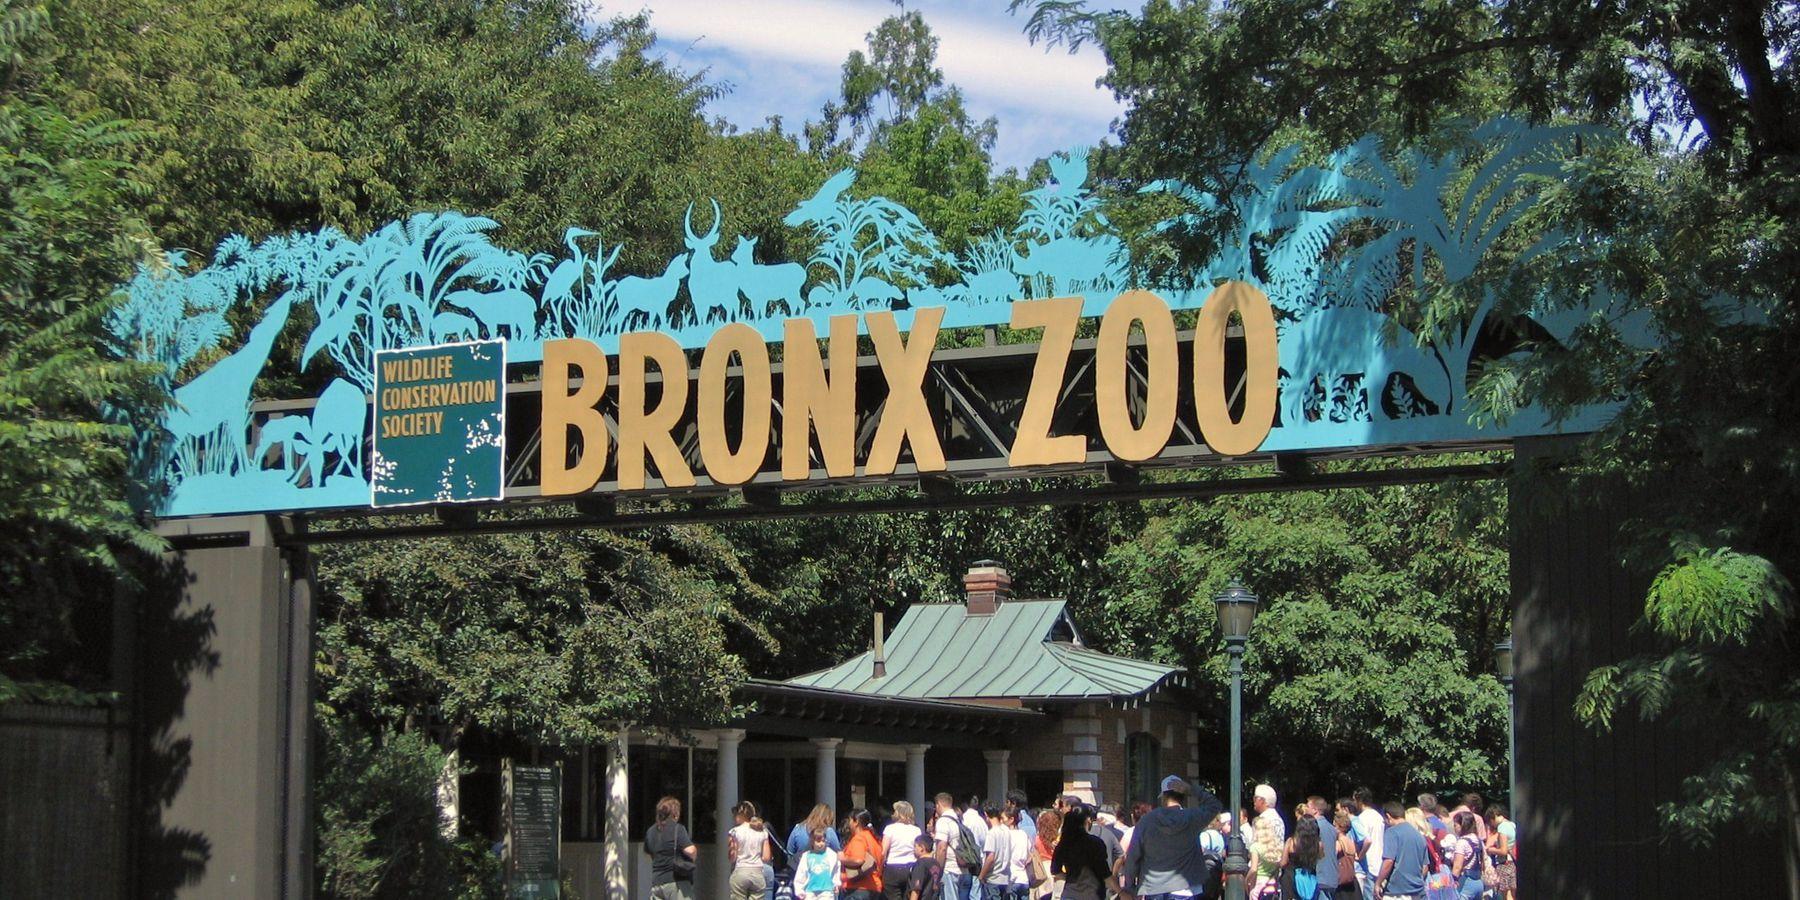 Bronx Zoo - New York - Doets Reizen